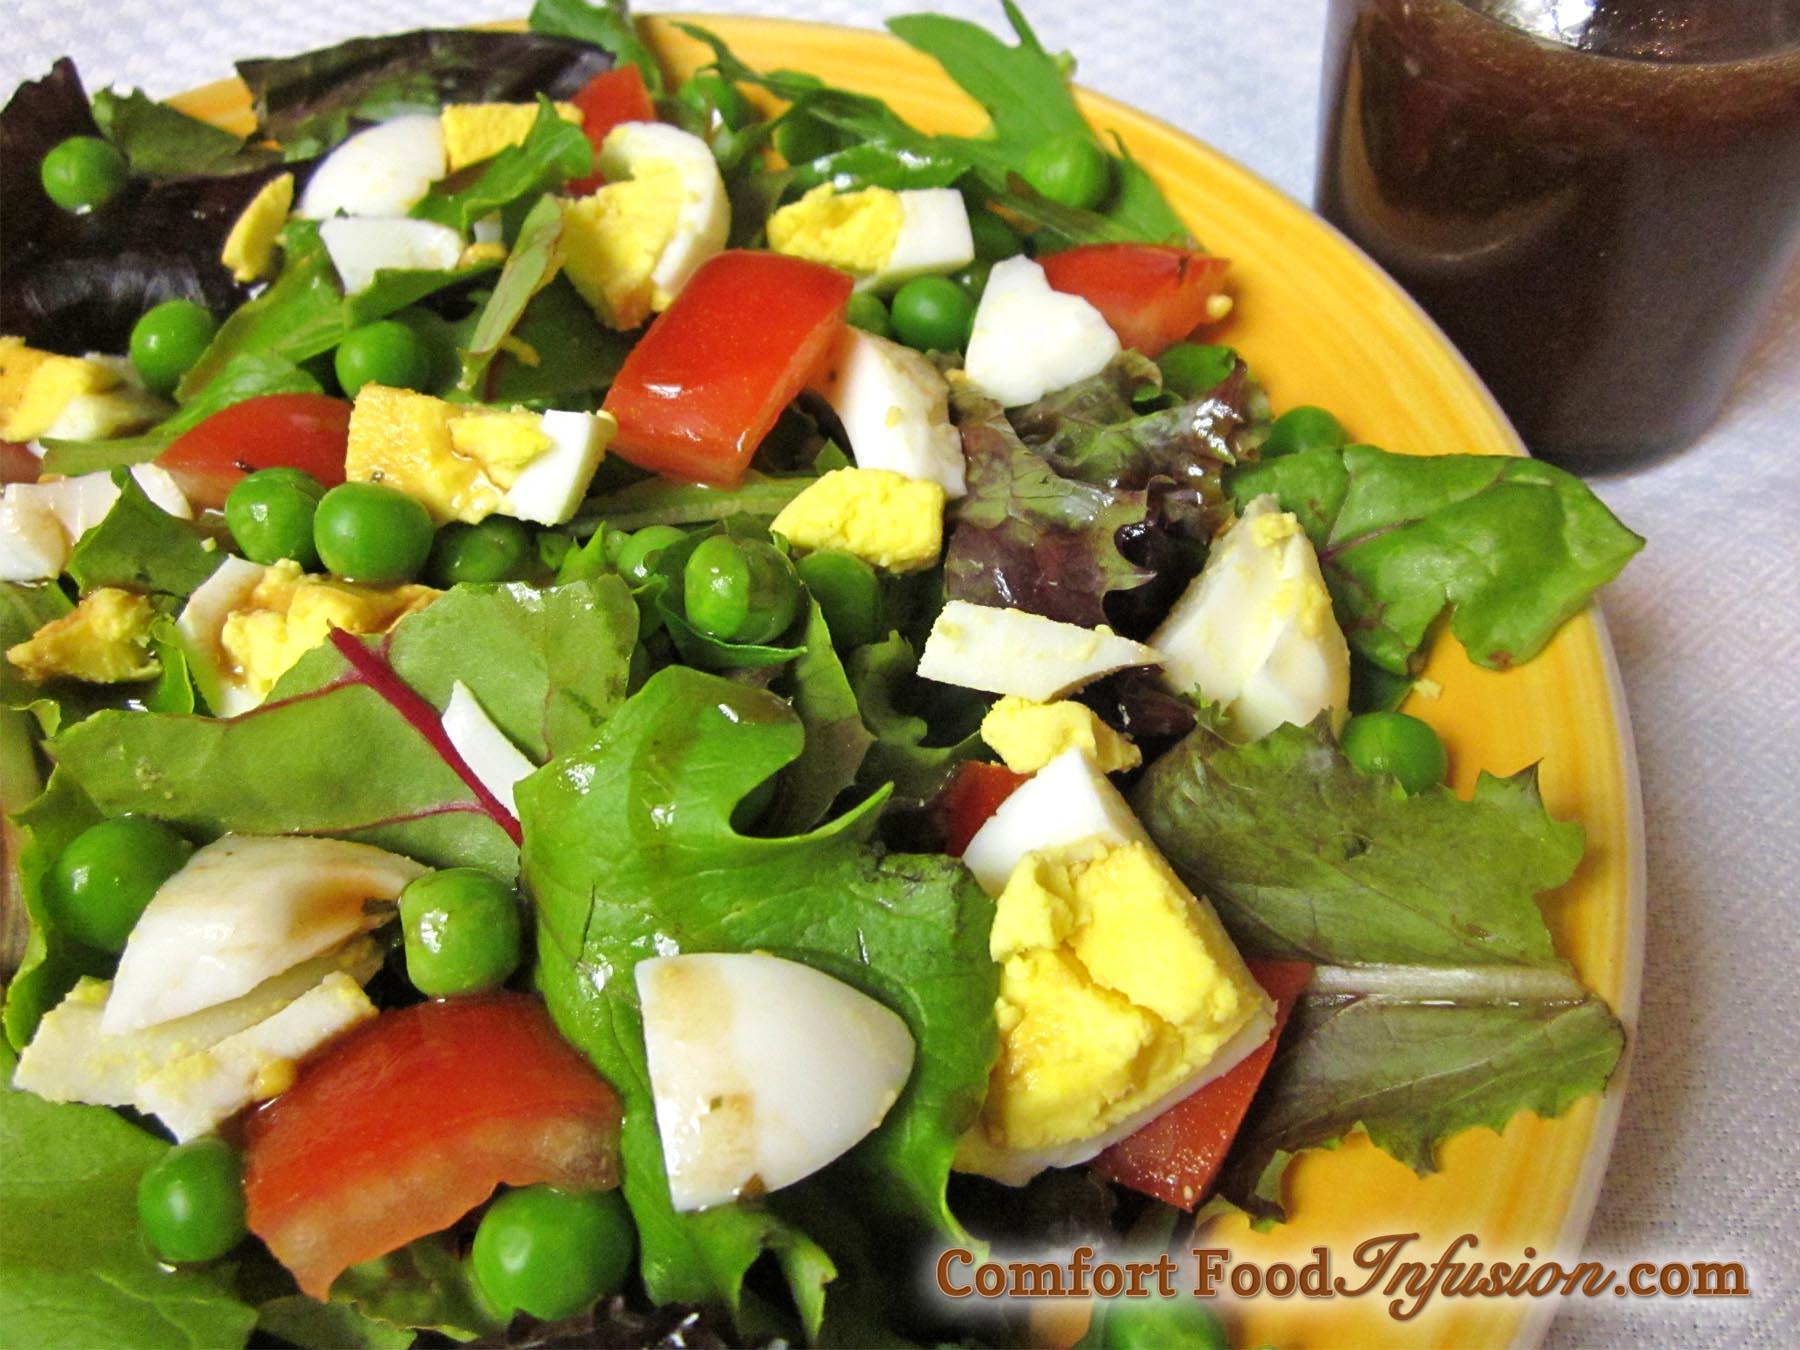 Mixed Greens and Egg Salad with Tarragon Vinaigrette